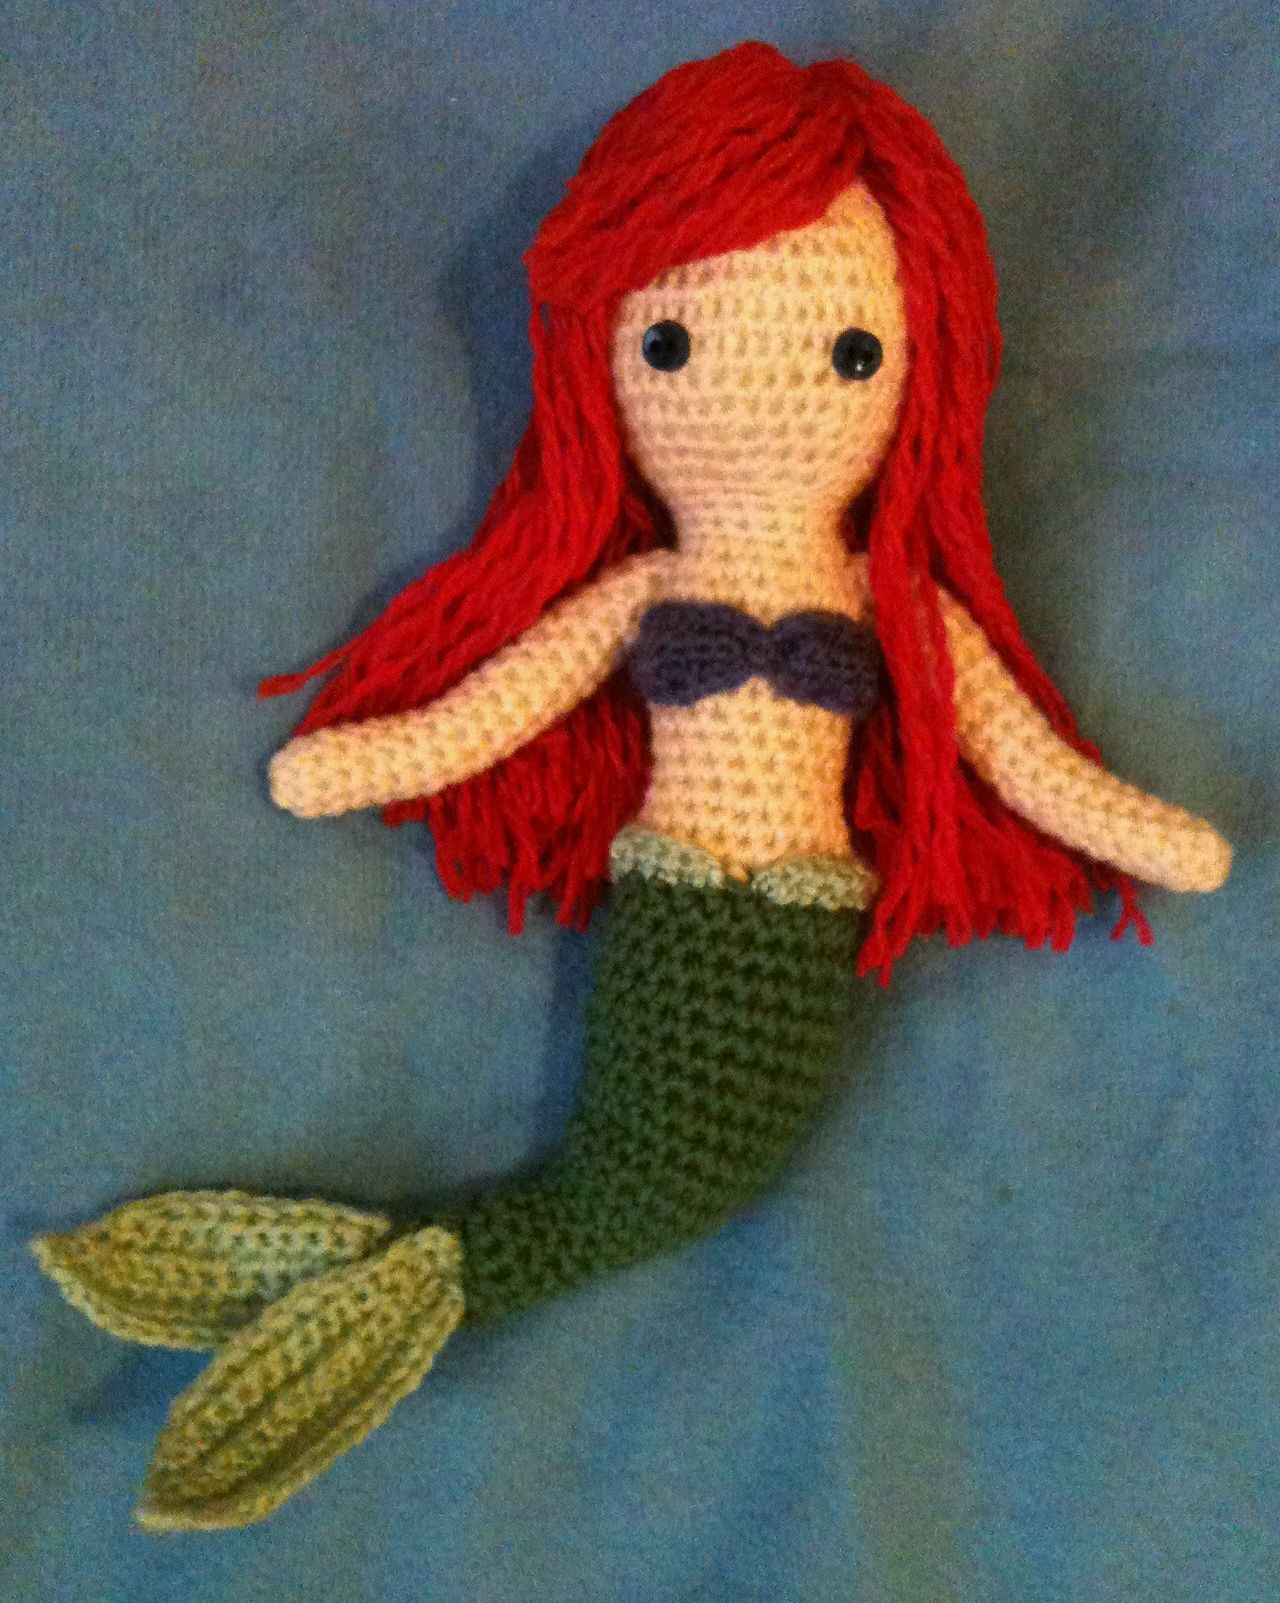 Crochet Amigurumi Mermaid Doll Patterns - Cool Creativities | 1603x1280